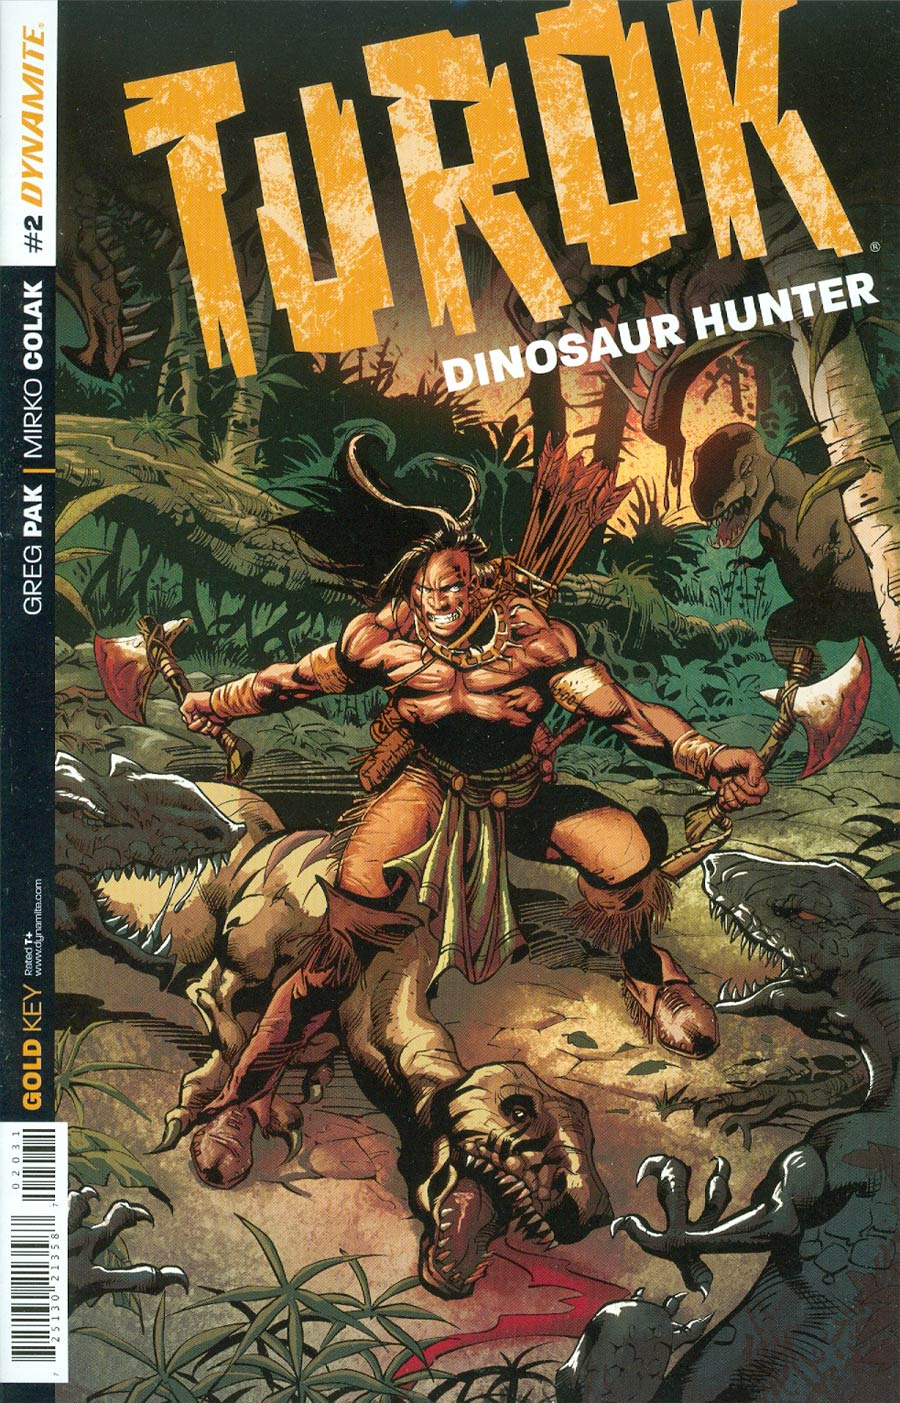 Turok Dinosaur Hunter Vol 2 #2 Cover D Incentive Roberto Castro Variant Cover